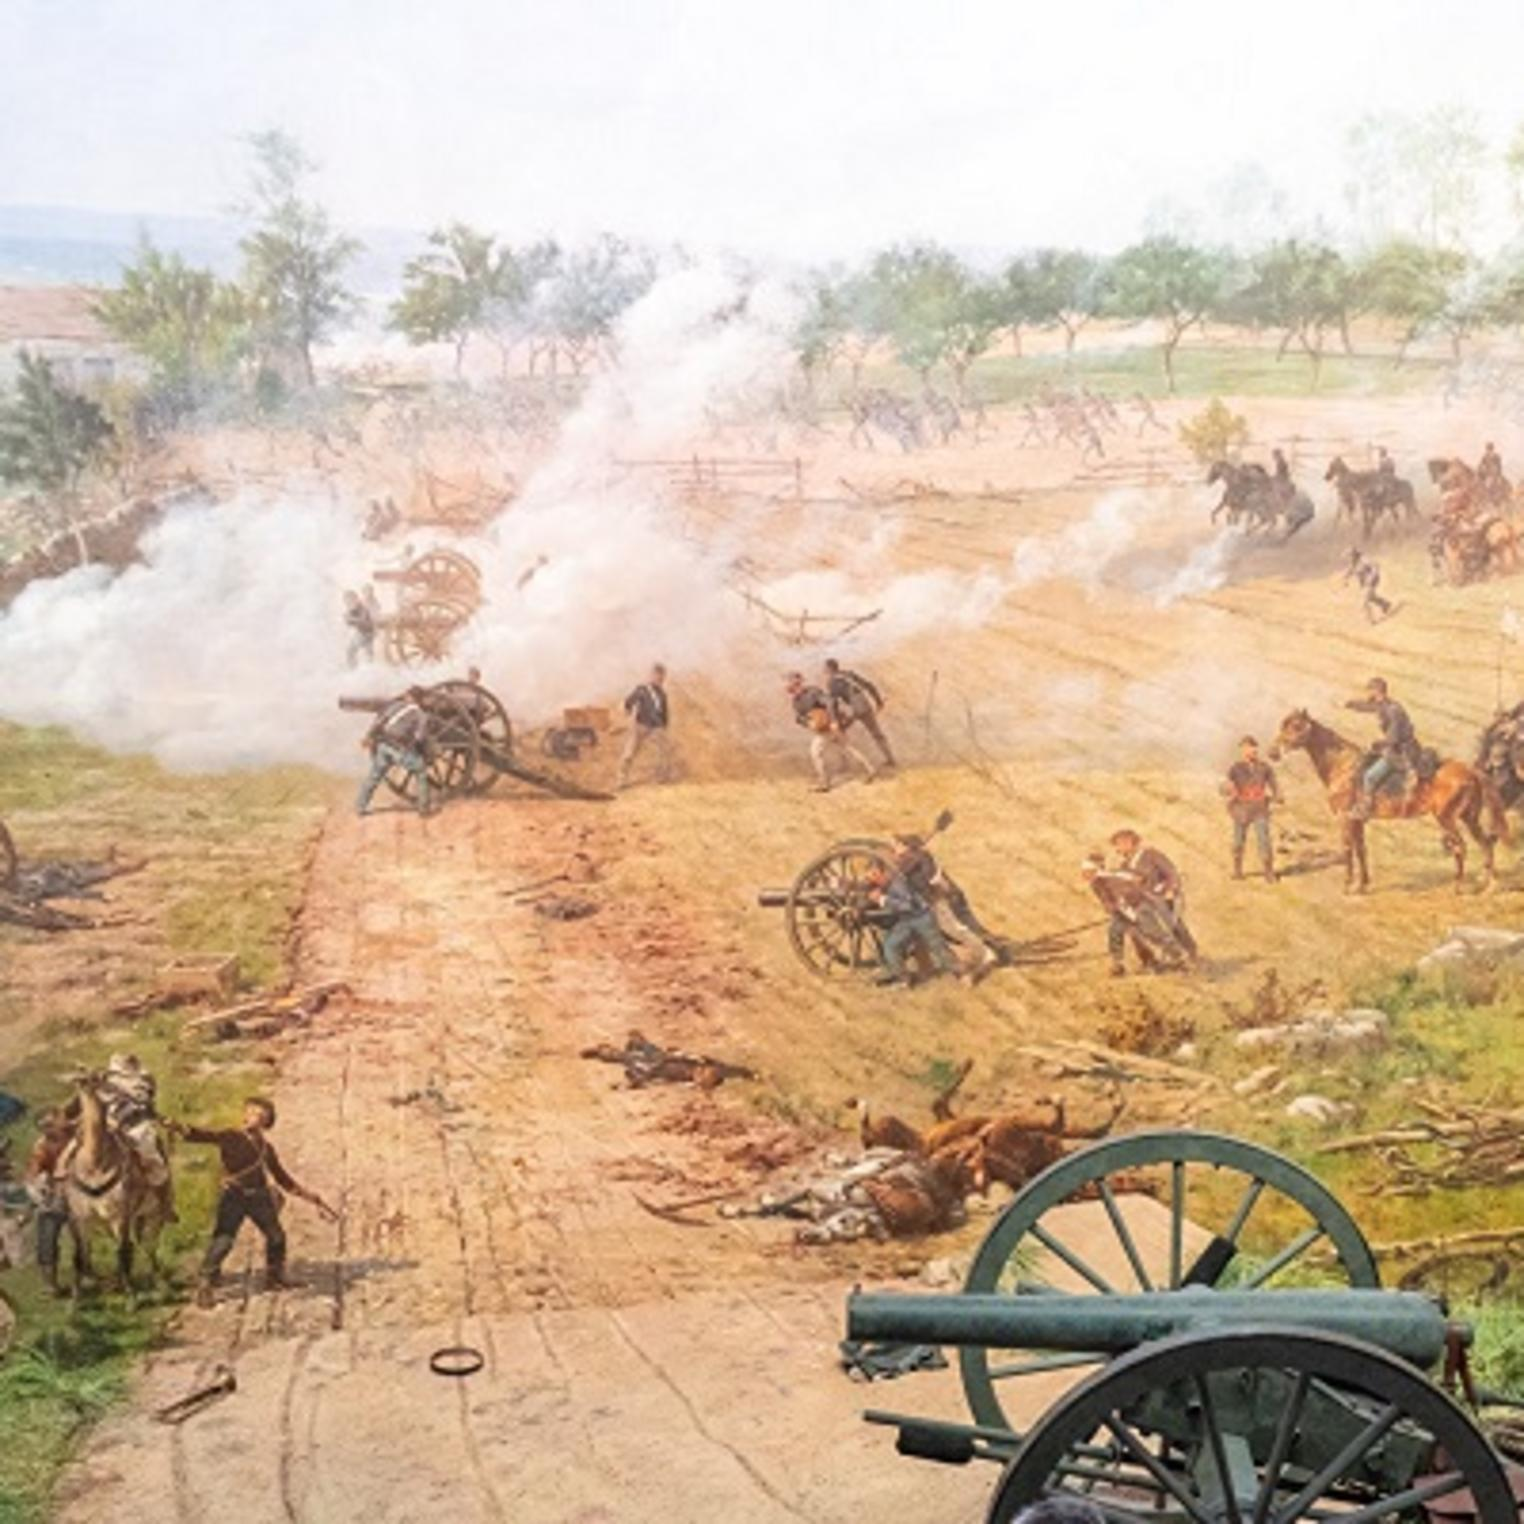 Gettysburg Cyclorama with Diorama